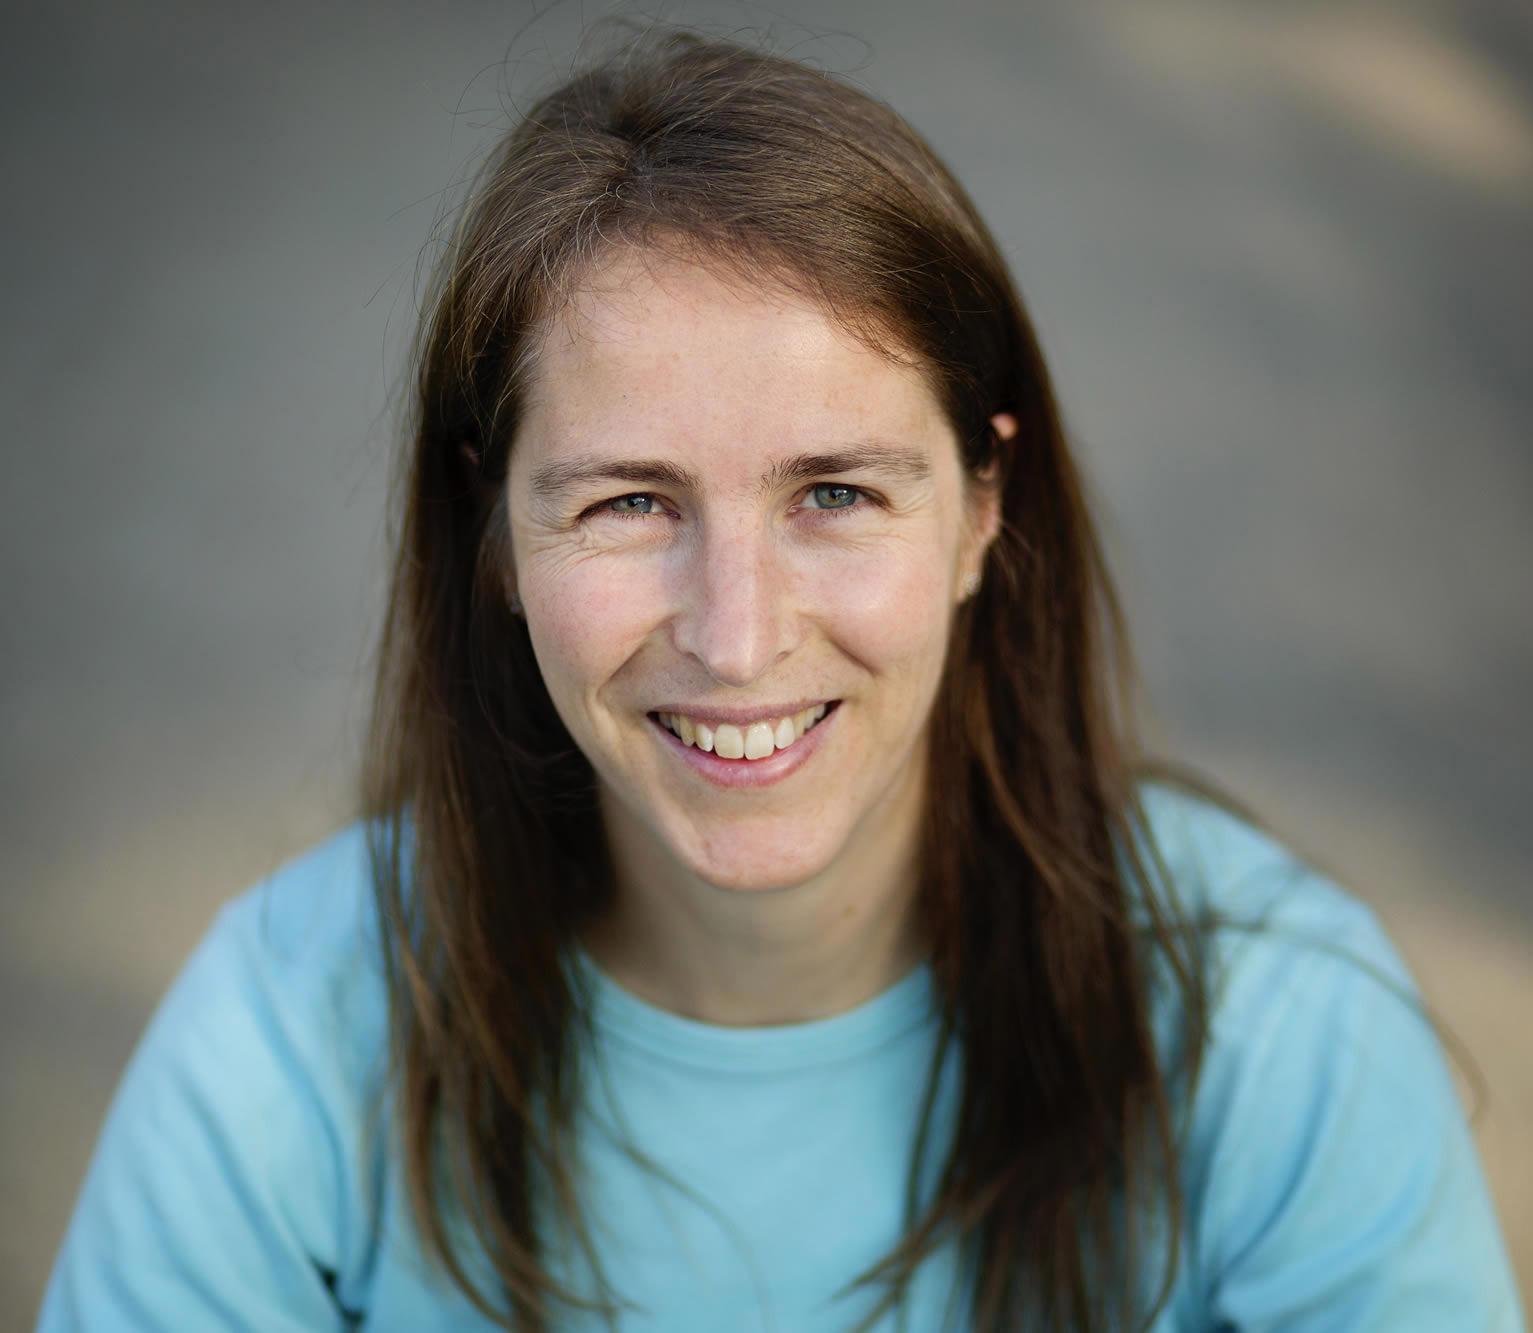 Larissa van Beek